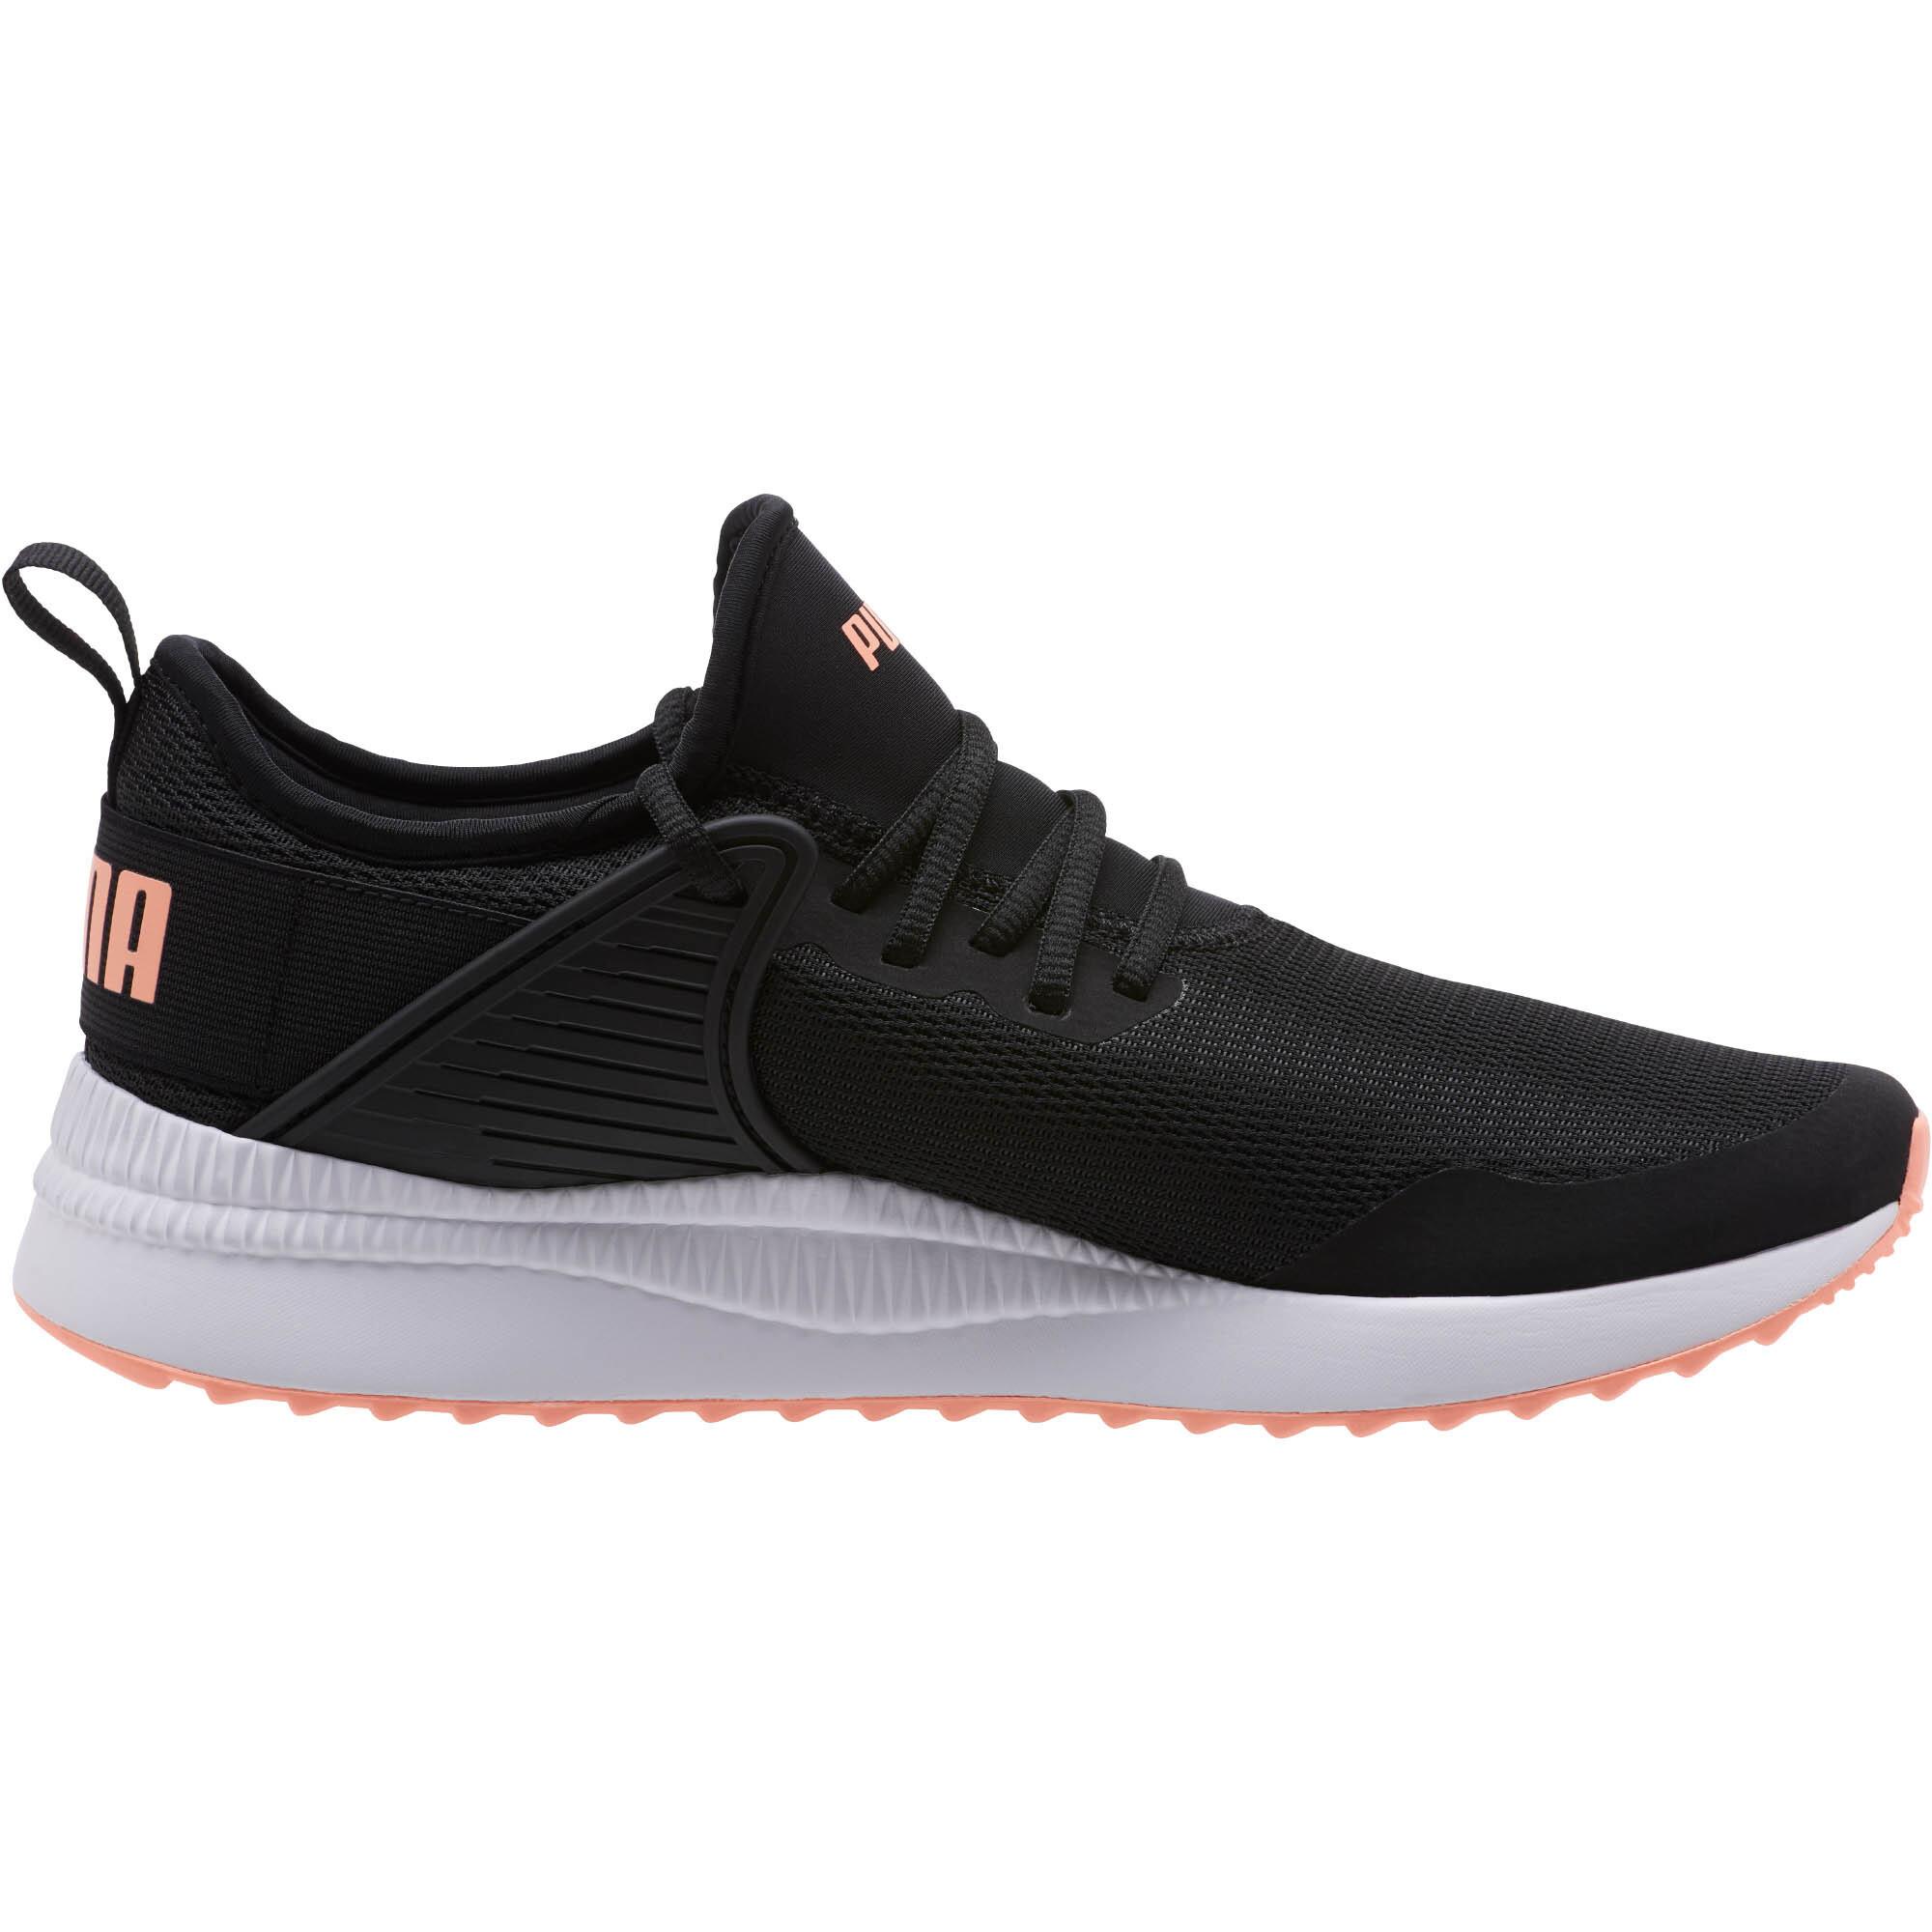 PUMA-Pacer-Next-Cage-Sneakers-Men-Shoe-Basics thumbnail 15